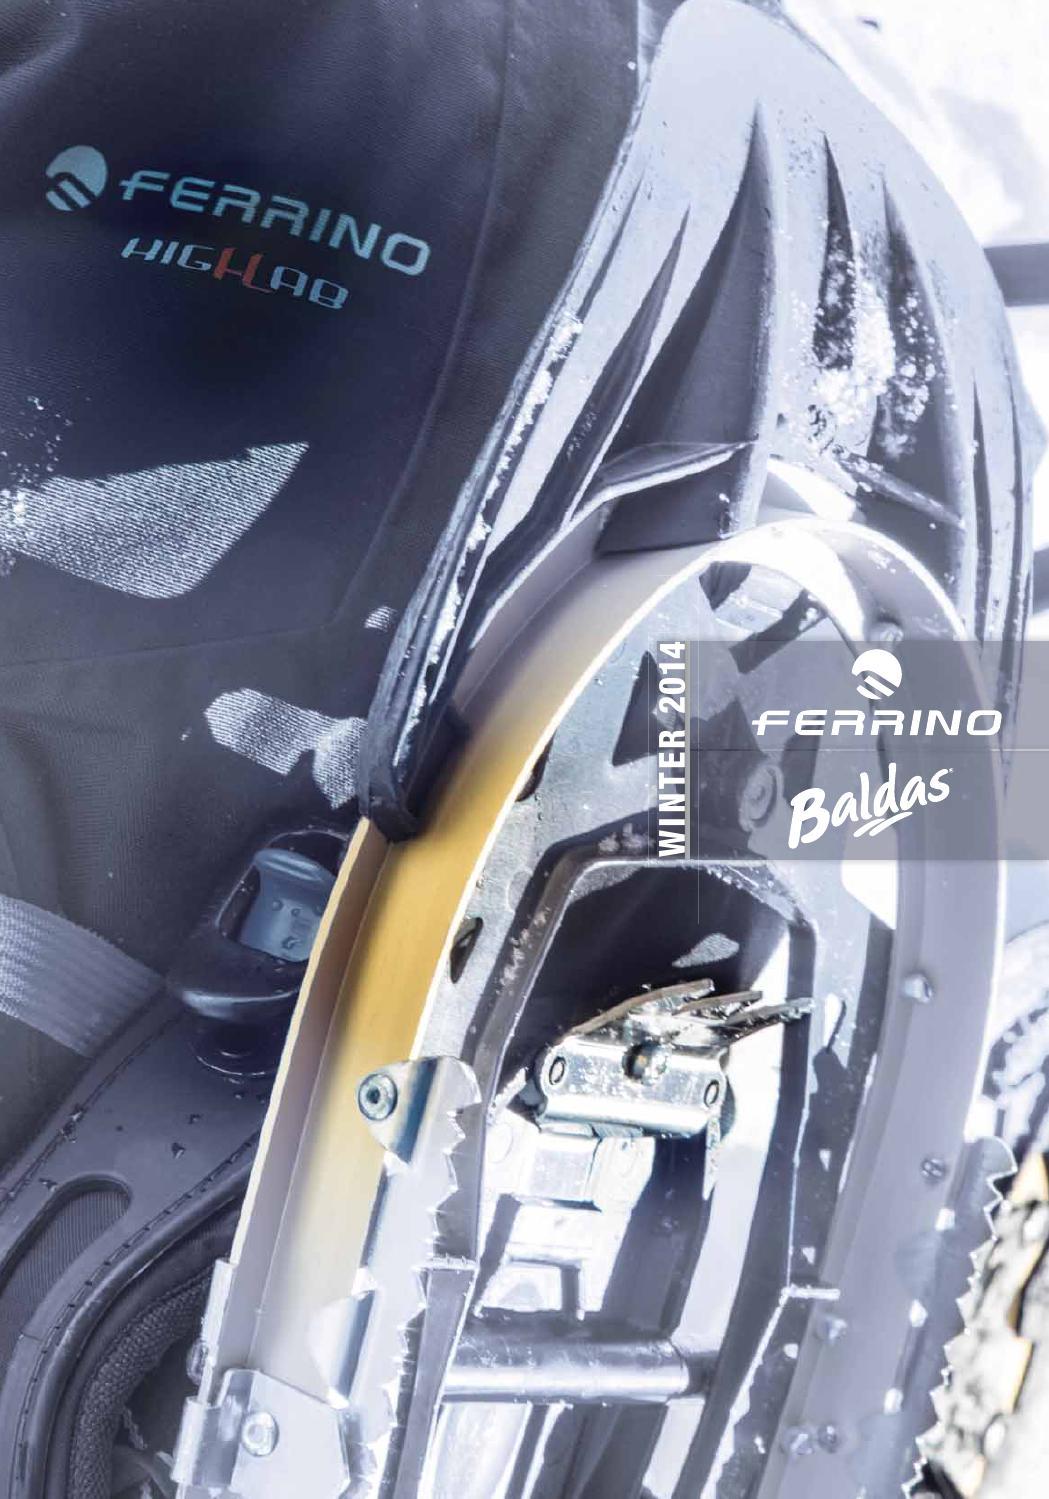 Ferrino - Catalogue Winter 2014.15 by MountainBlogIT - issuu 00cd2cc02a8f